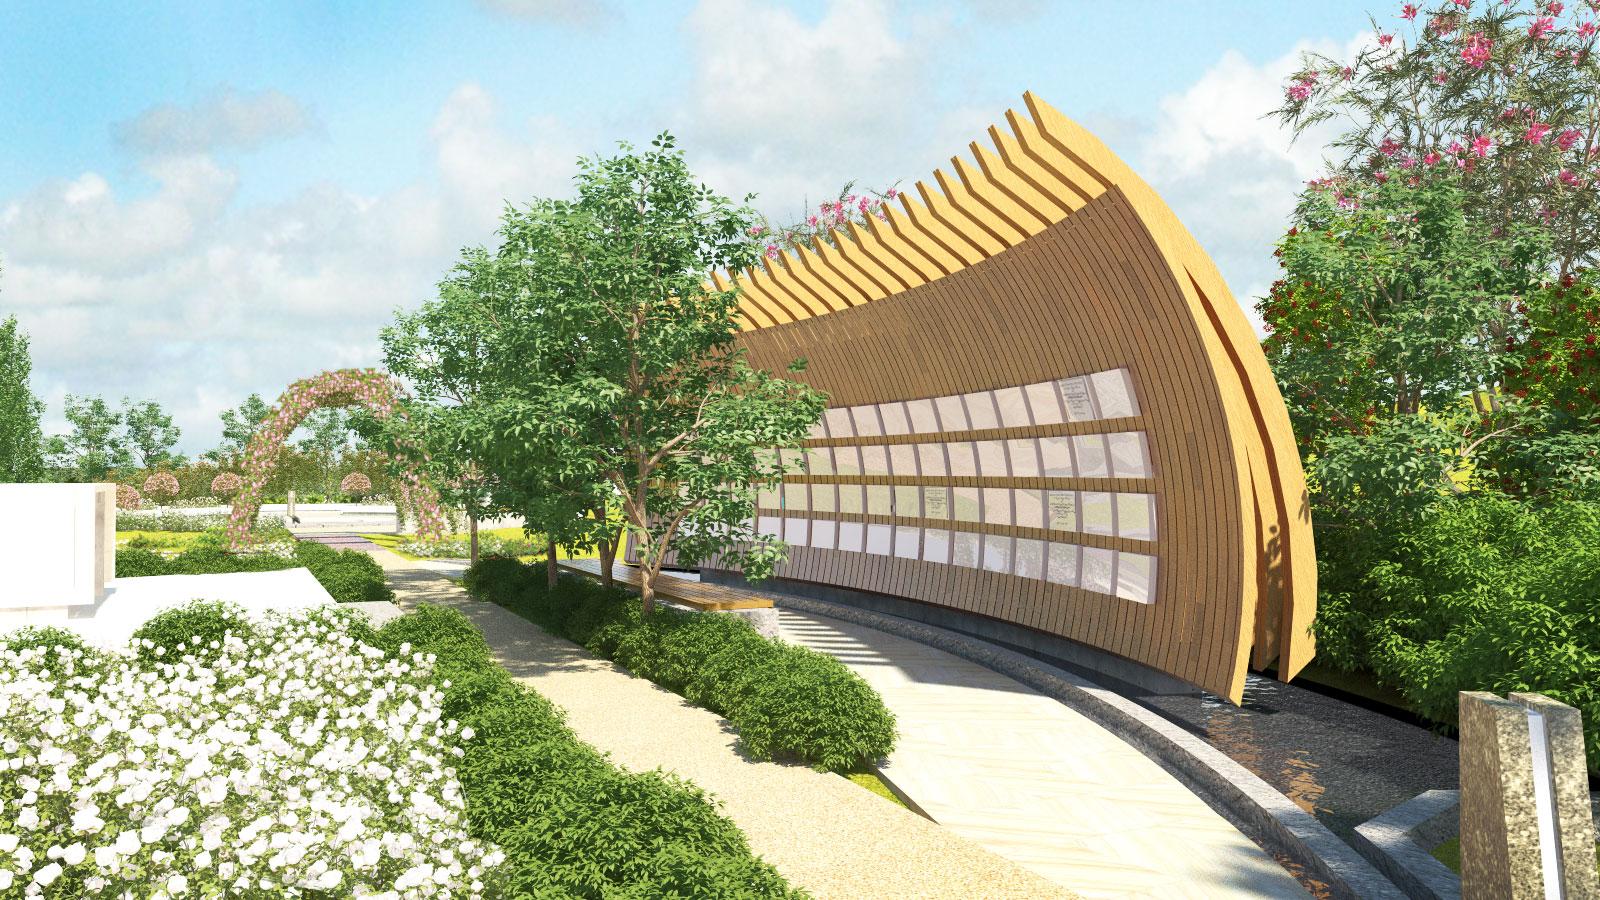 Sensory Gardens & Memorials Wave Wall Columbaria Sculpture Architectural Render – Garnder Wetherill GW 3